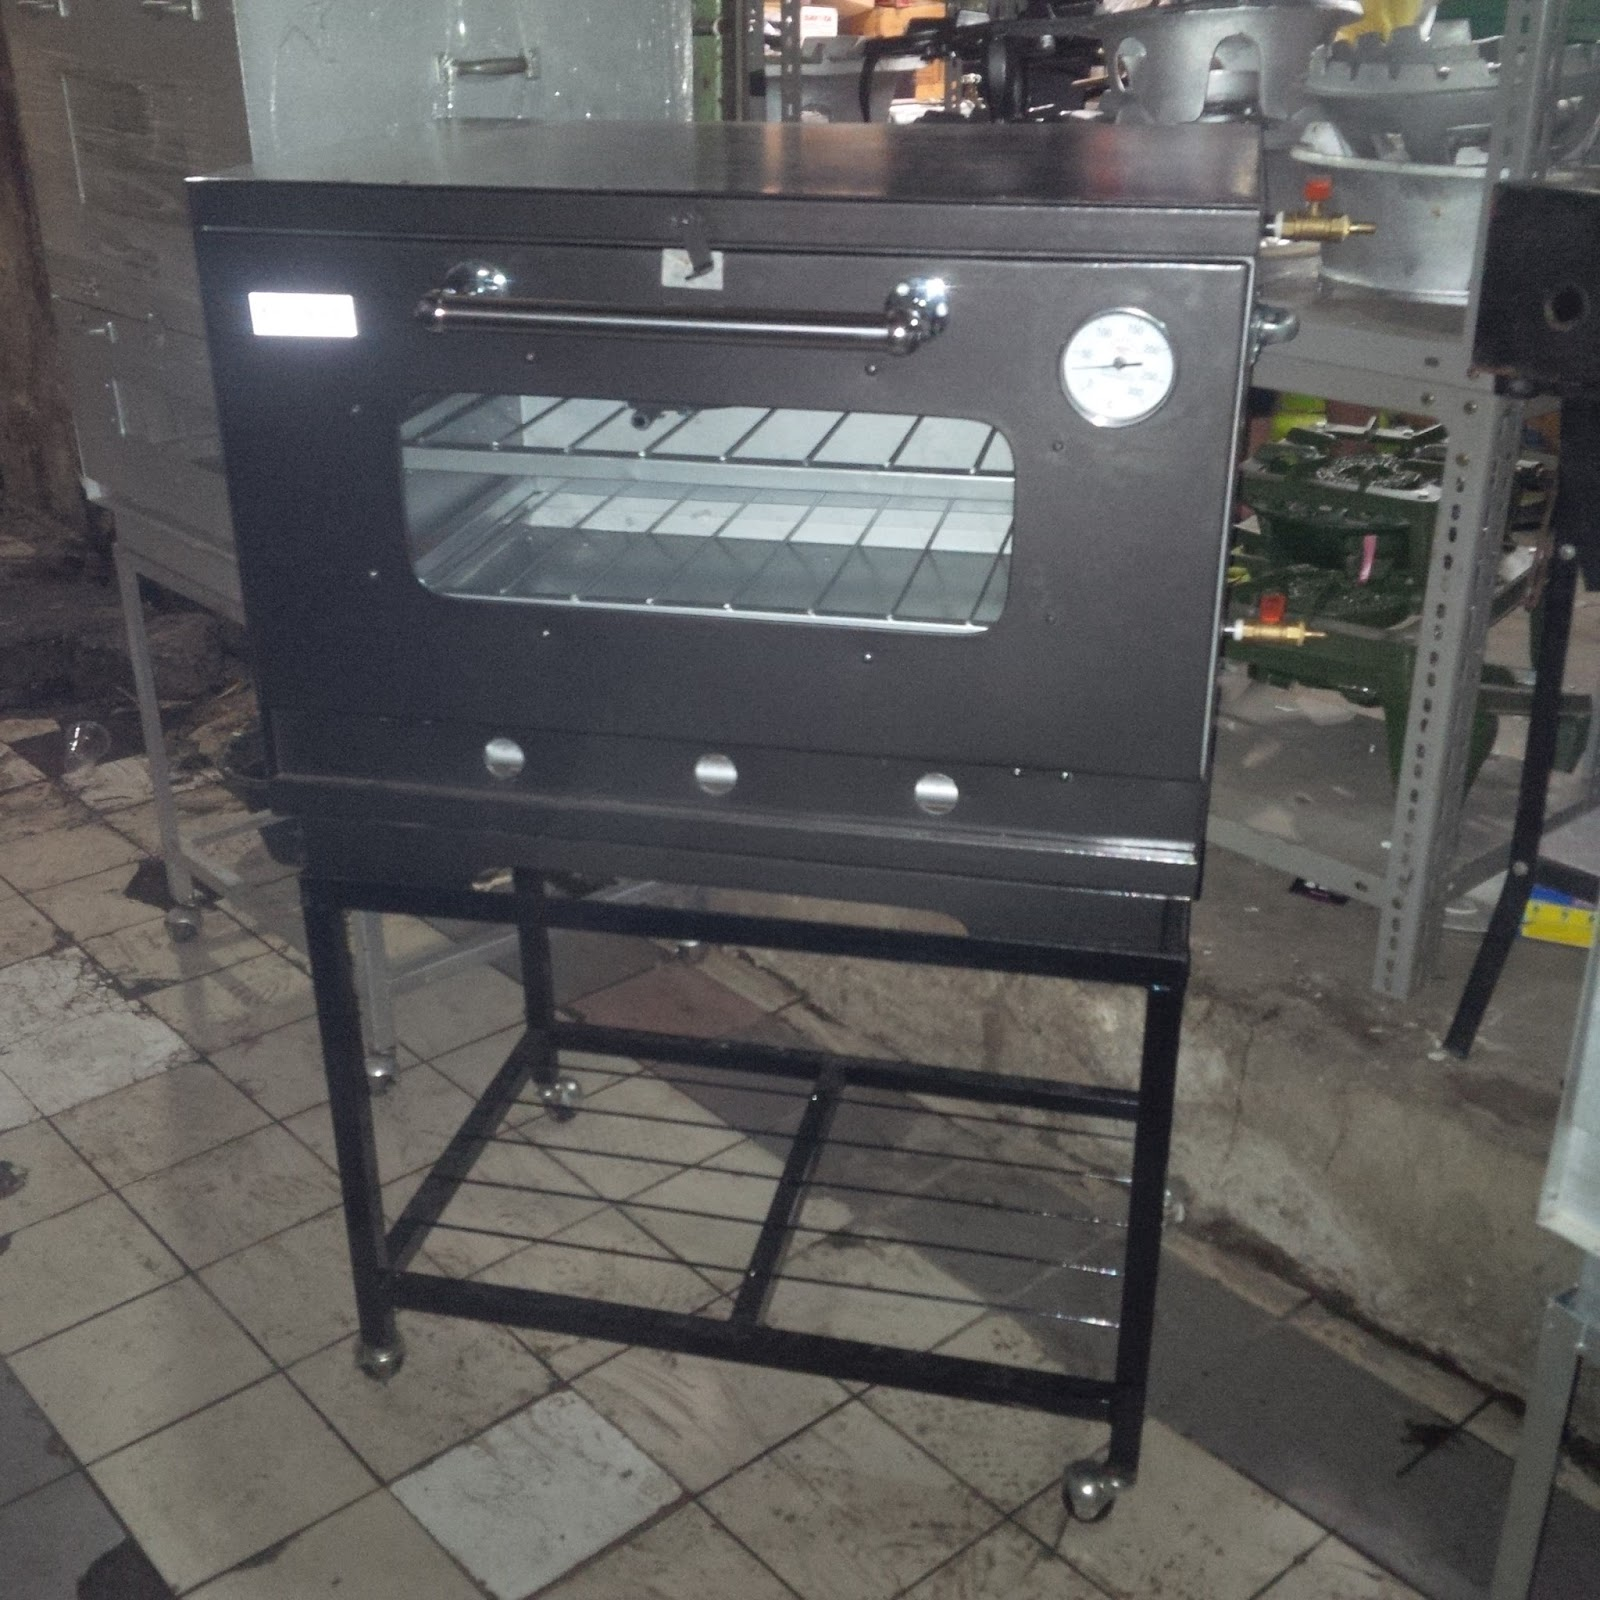 Harga Oven Gas Biasa 5